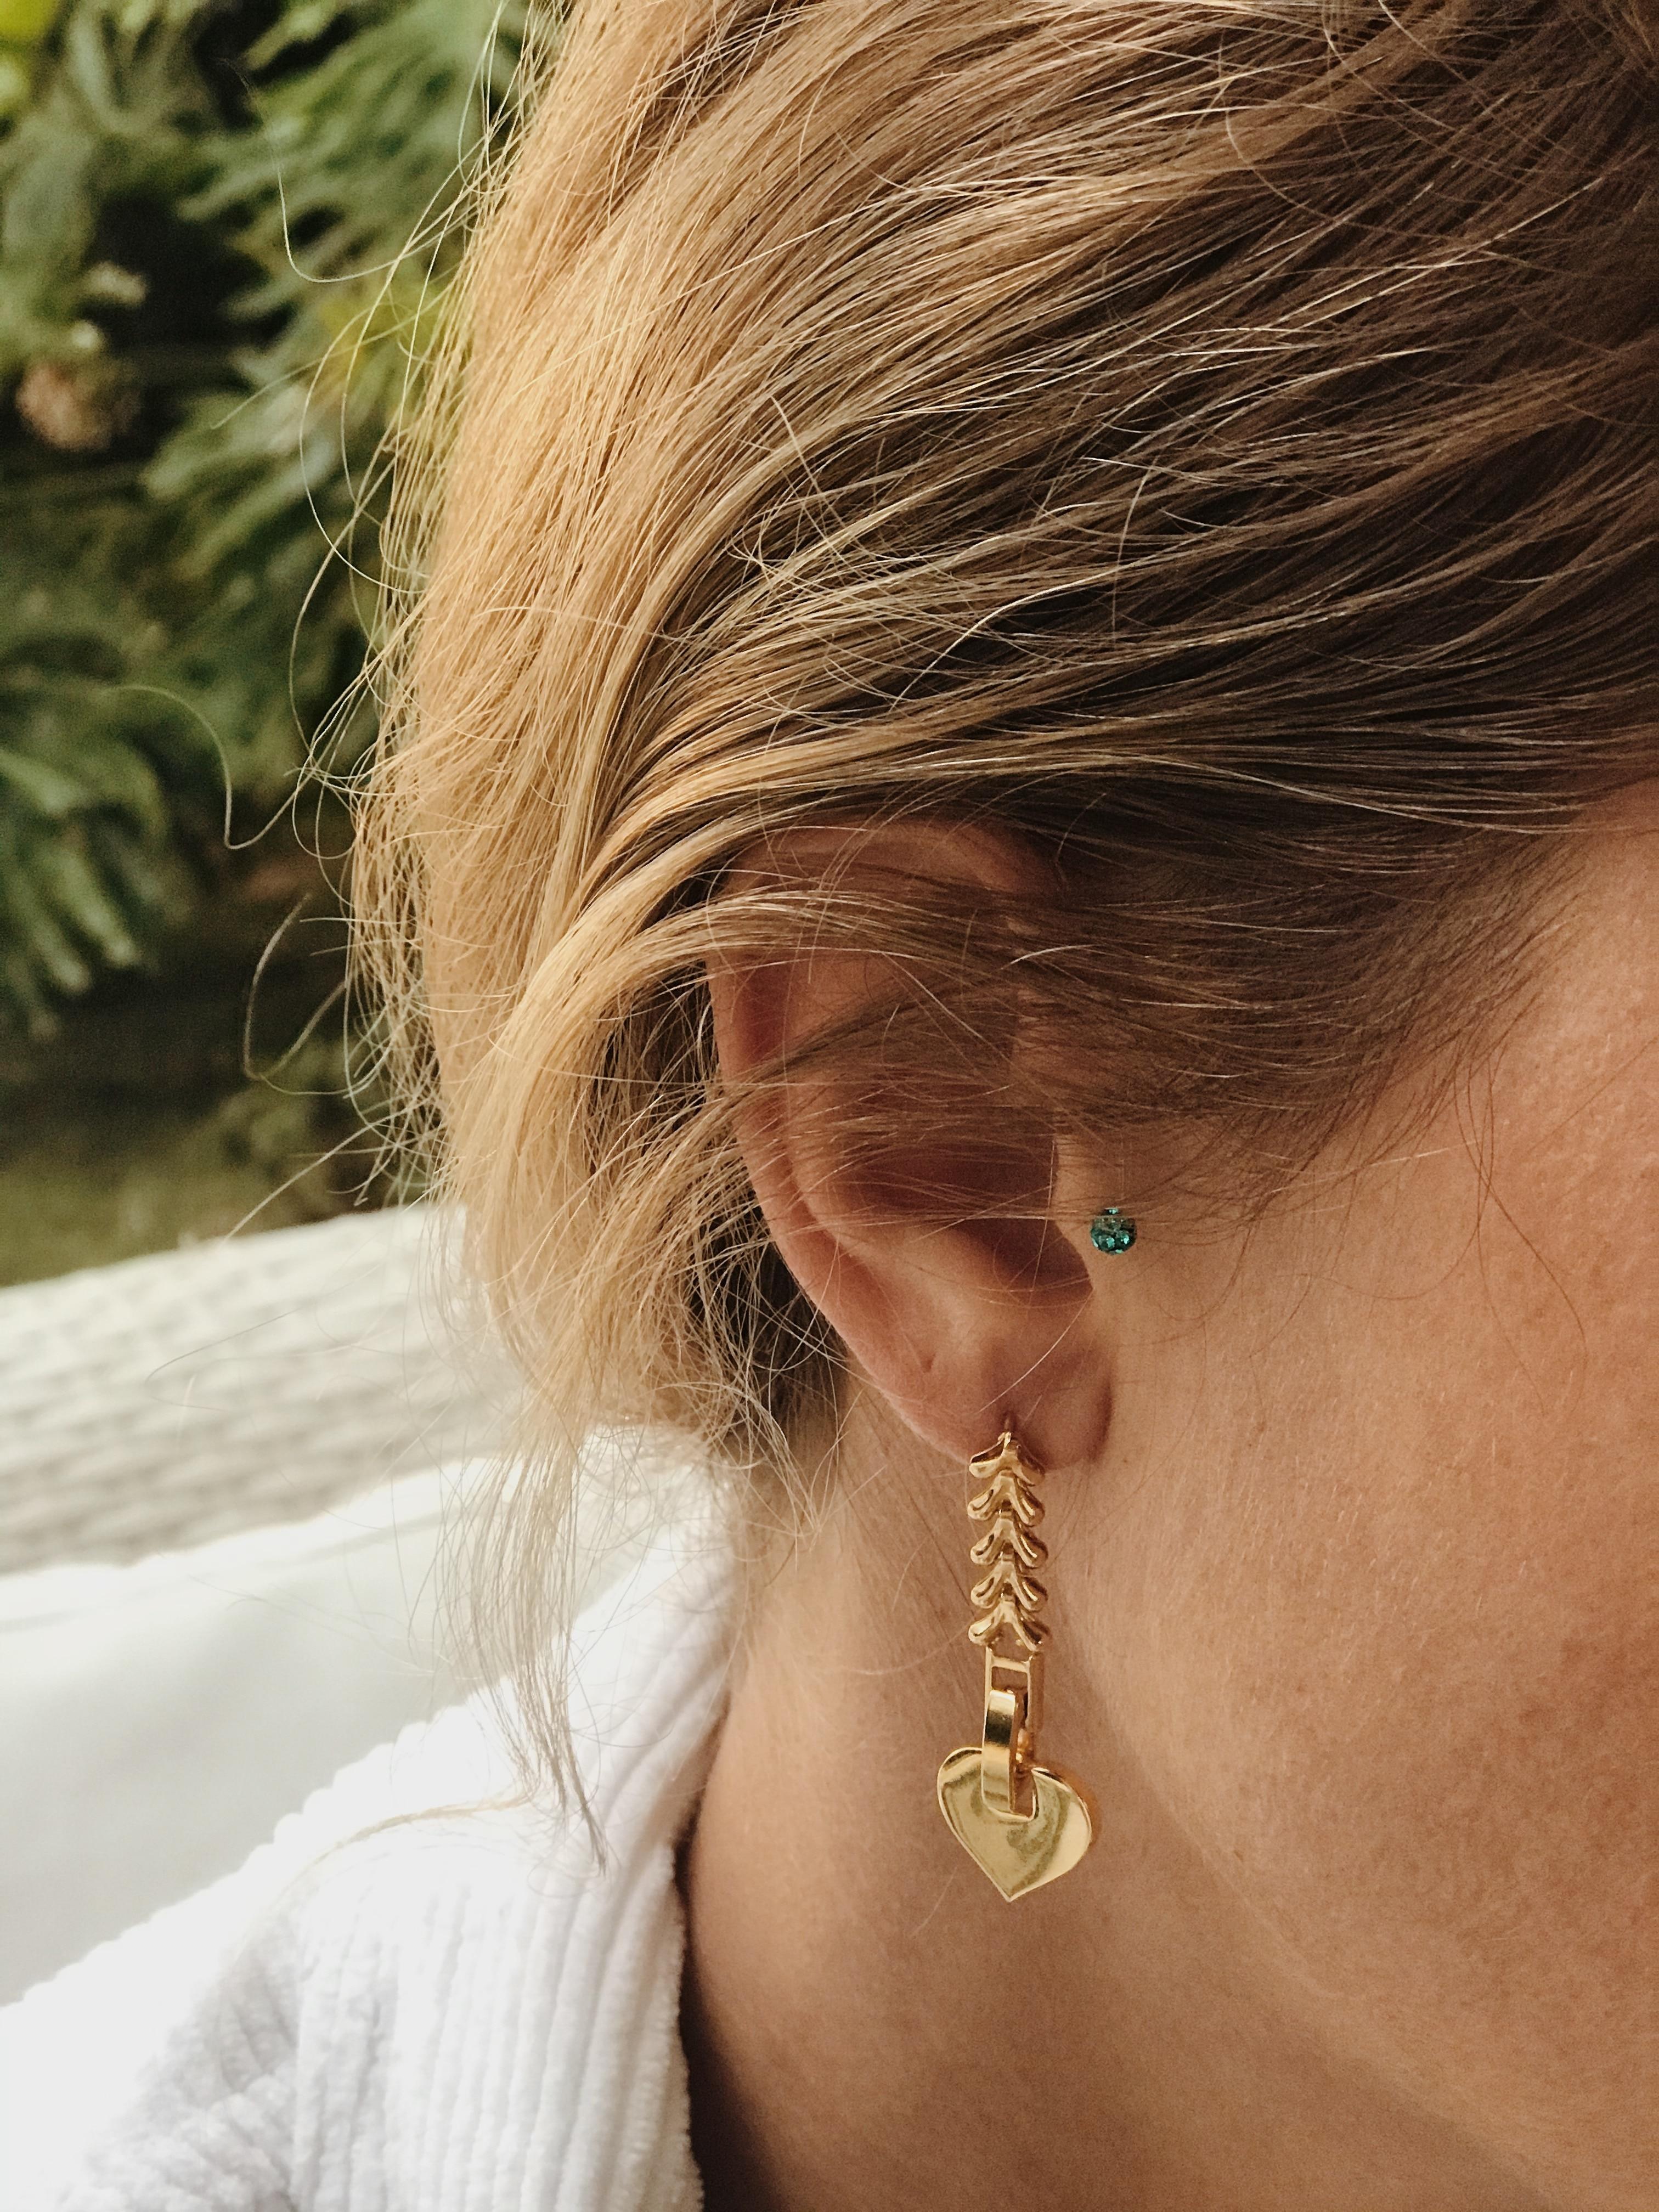 GULCE DERELI-أقراط ساحرة ، رمز قلب صغير ، أقراط سلسلة إنفينيتي ، علبة هدايا ، مطلية بالذهب والفضة